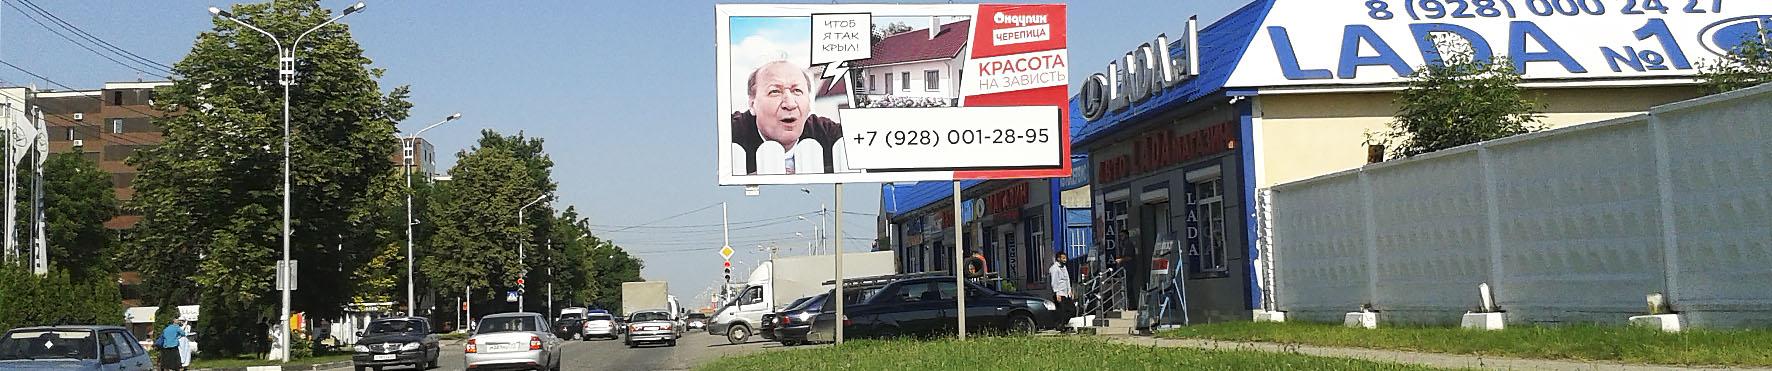 Реклама наружная 3х6 Грозный билборд